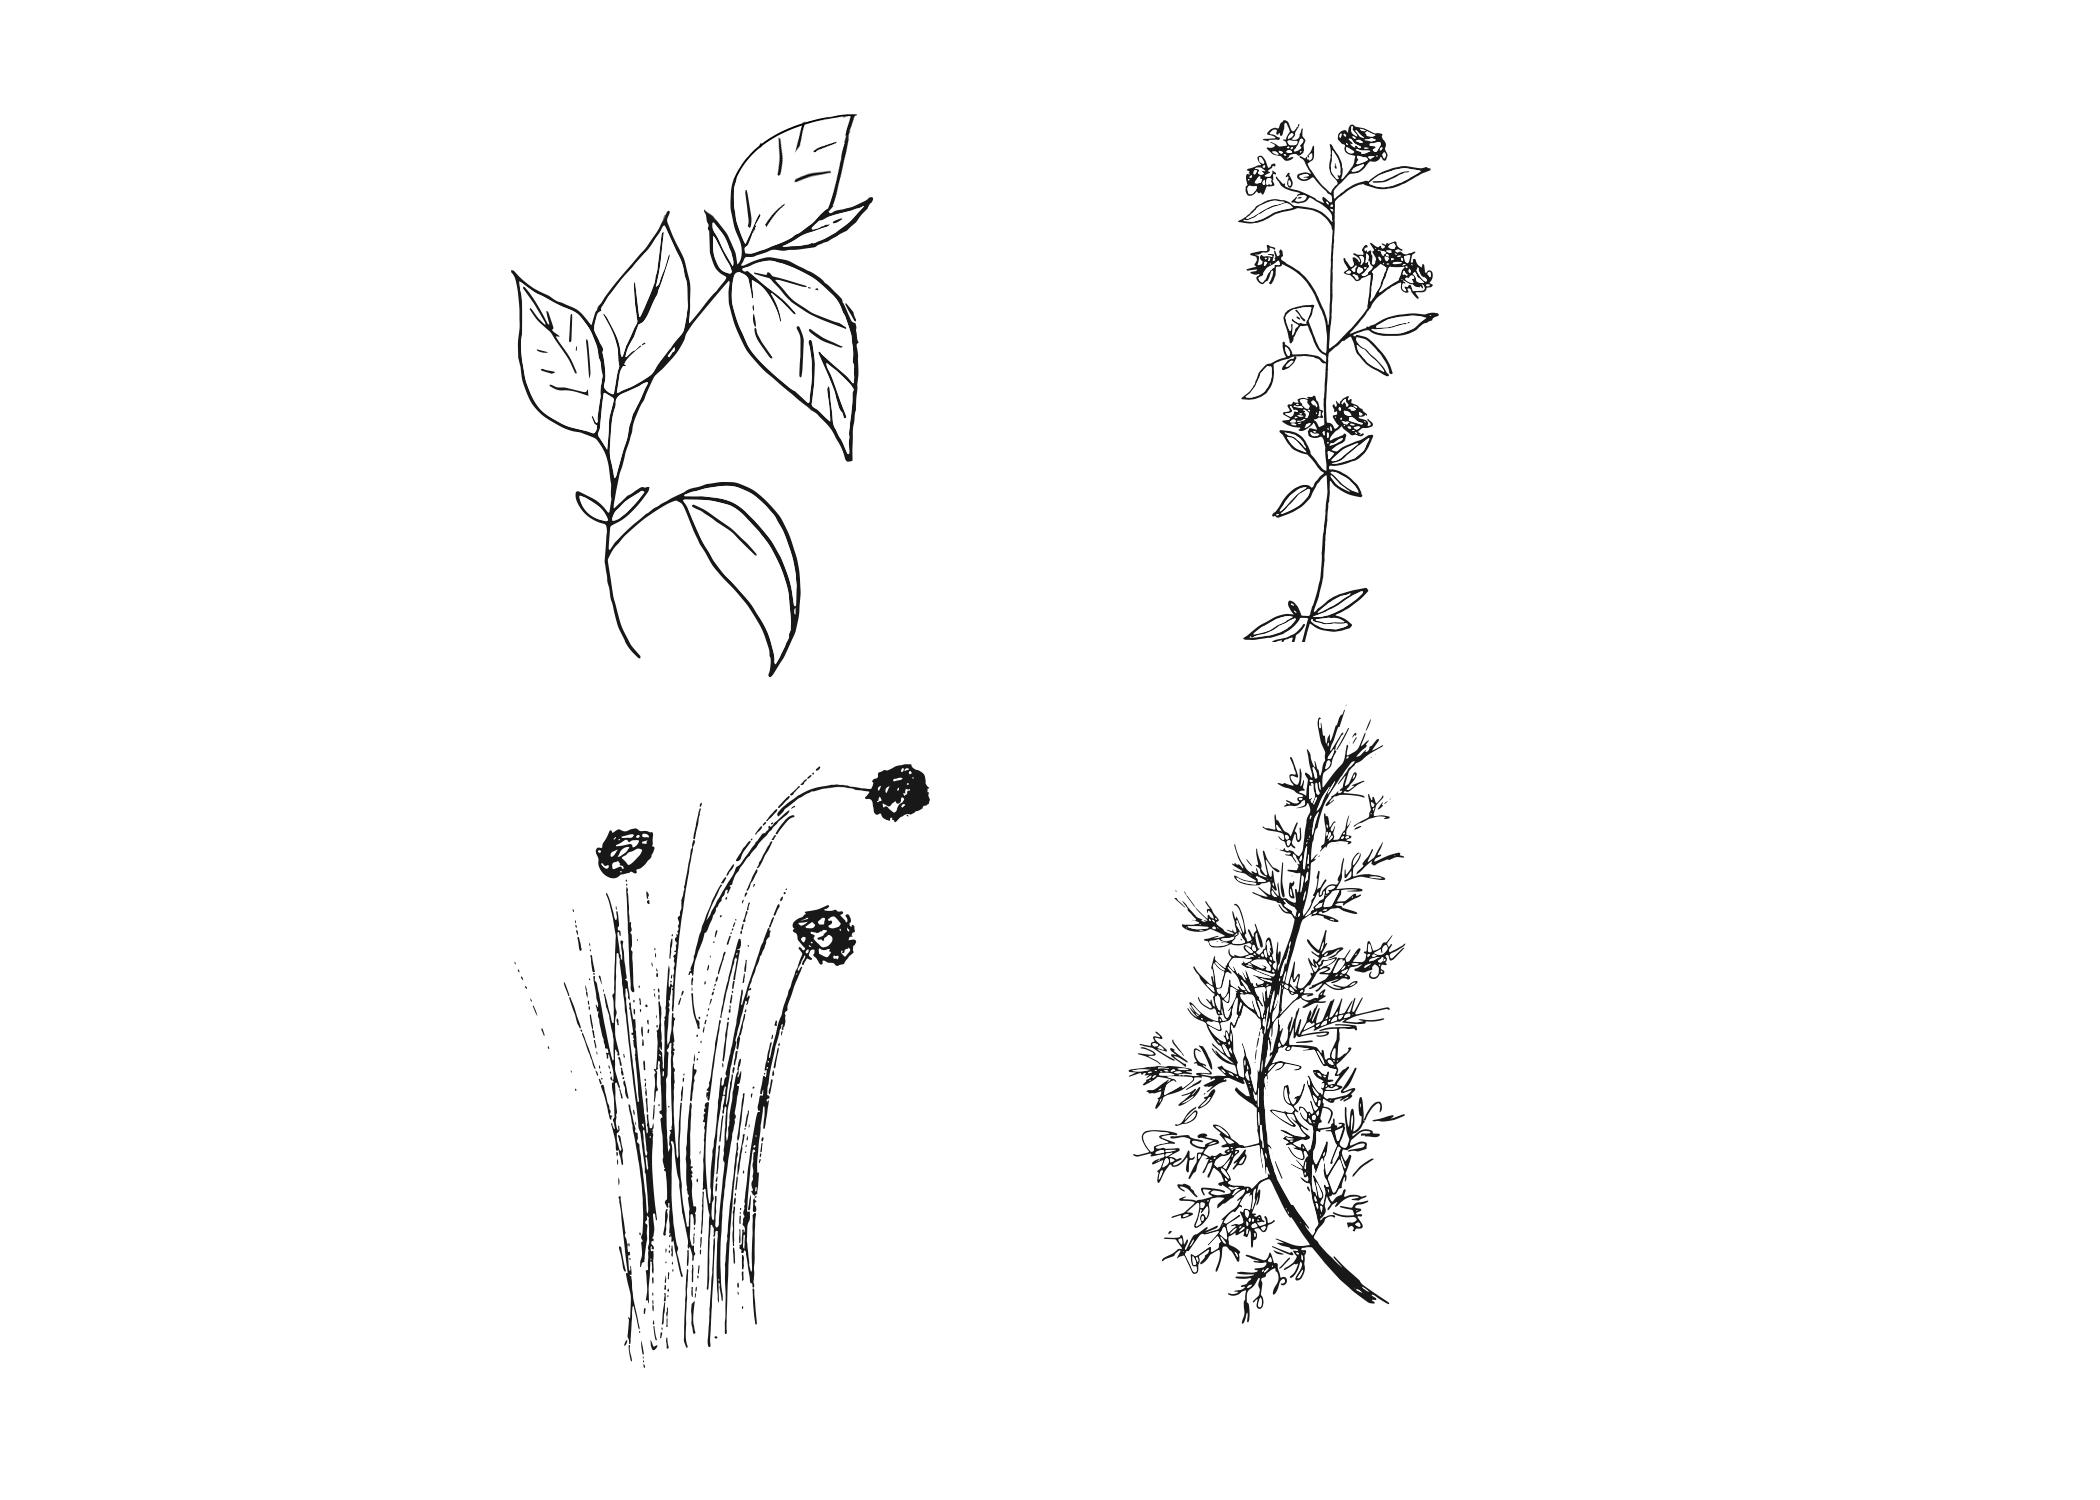 Hand Drawn Plants Minimalistic Drawing Tattoo Ideas Simple Art Illustration Illustrationartis Simple Art How To Draw Hands Illustration Art Kids